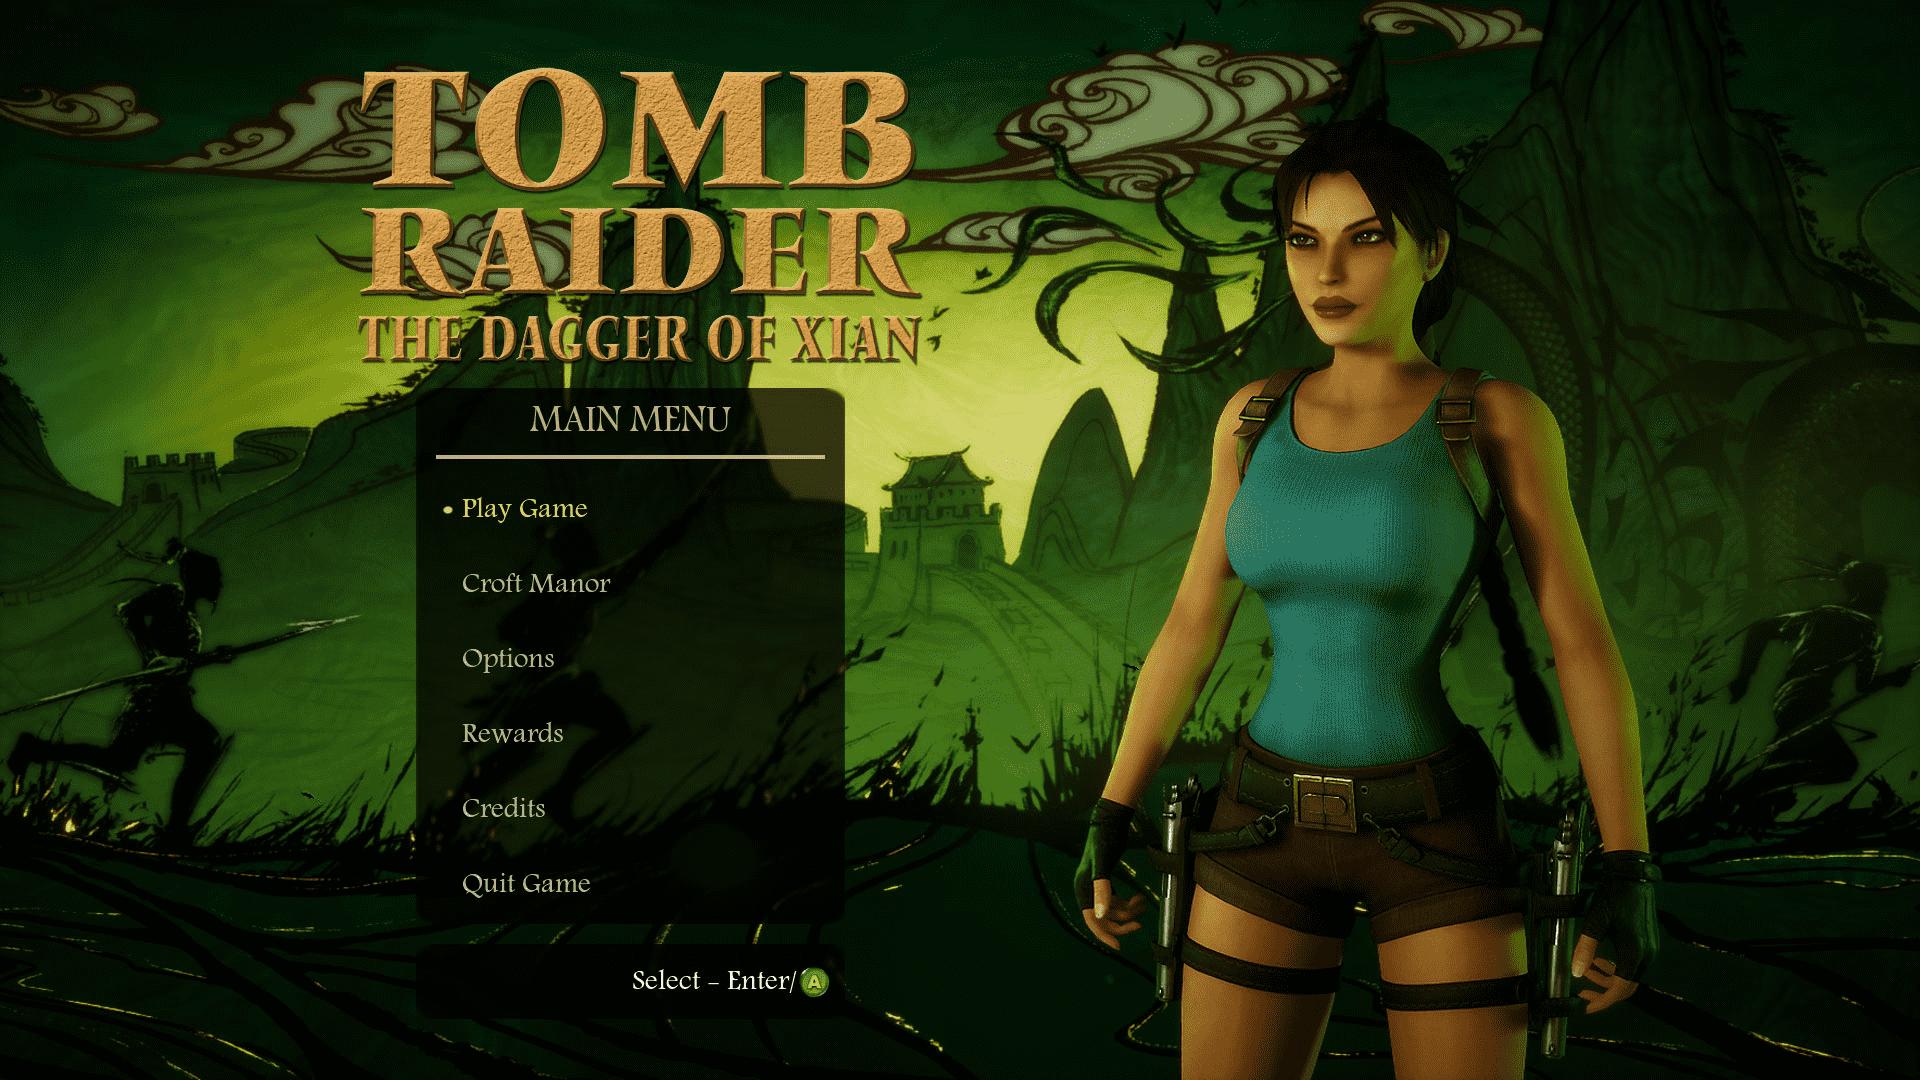 Download tomb raider the dagger of xian demo | techpowerup.